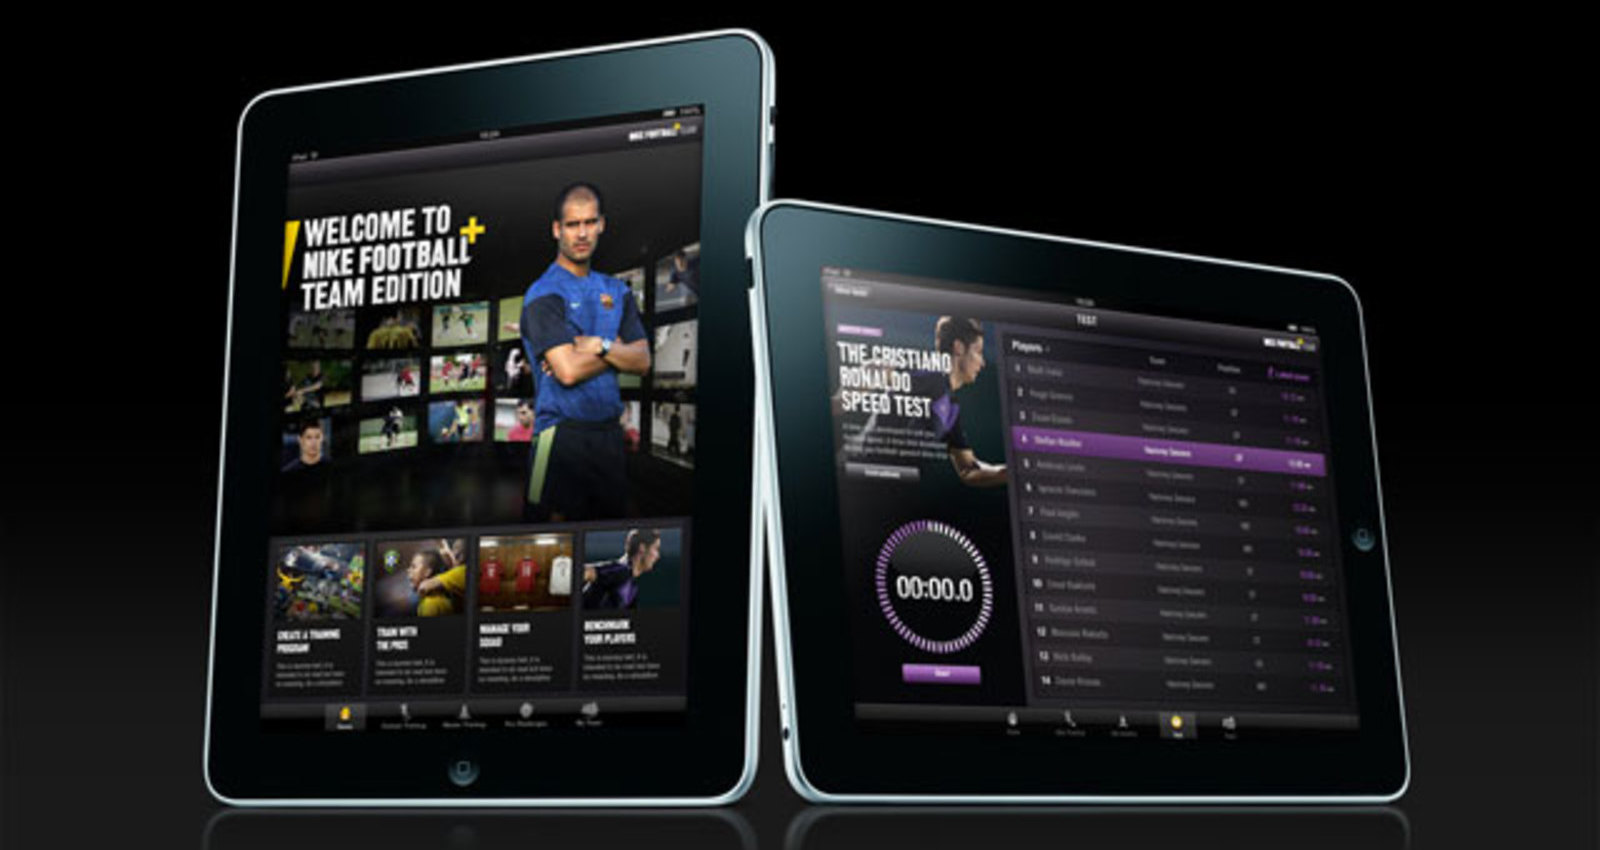 Nike Football+ Team Edition for iPad